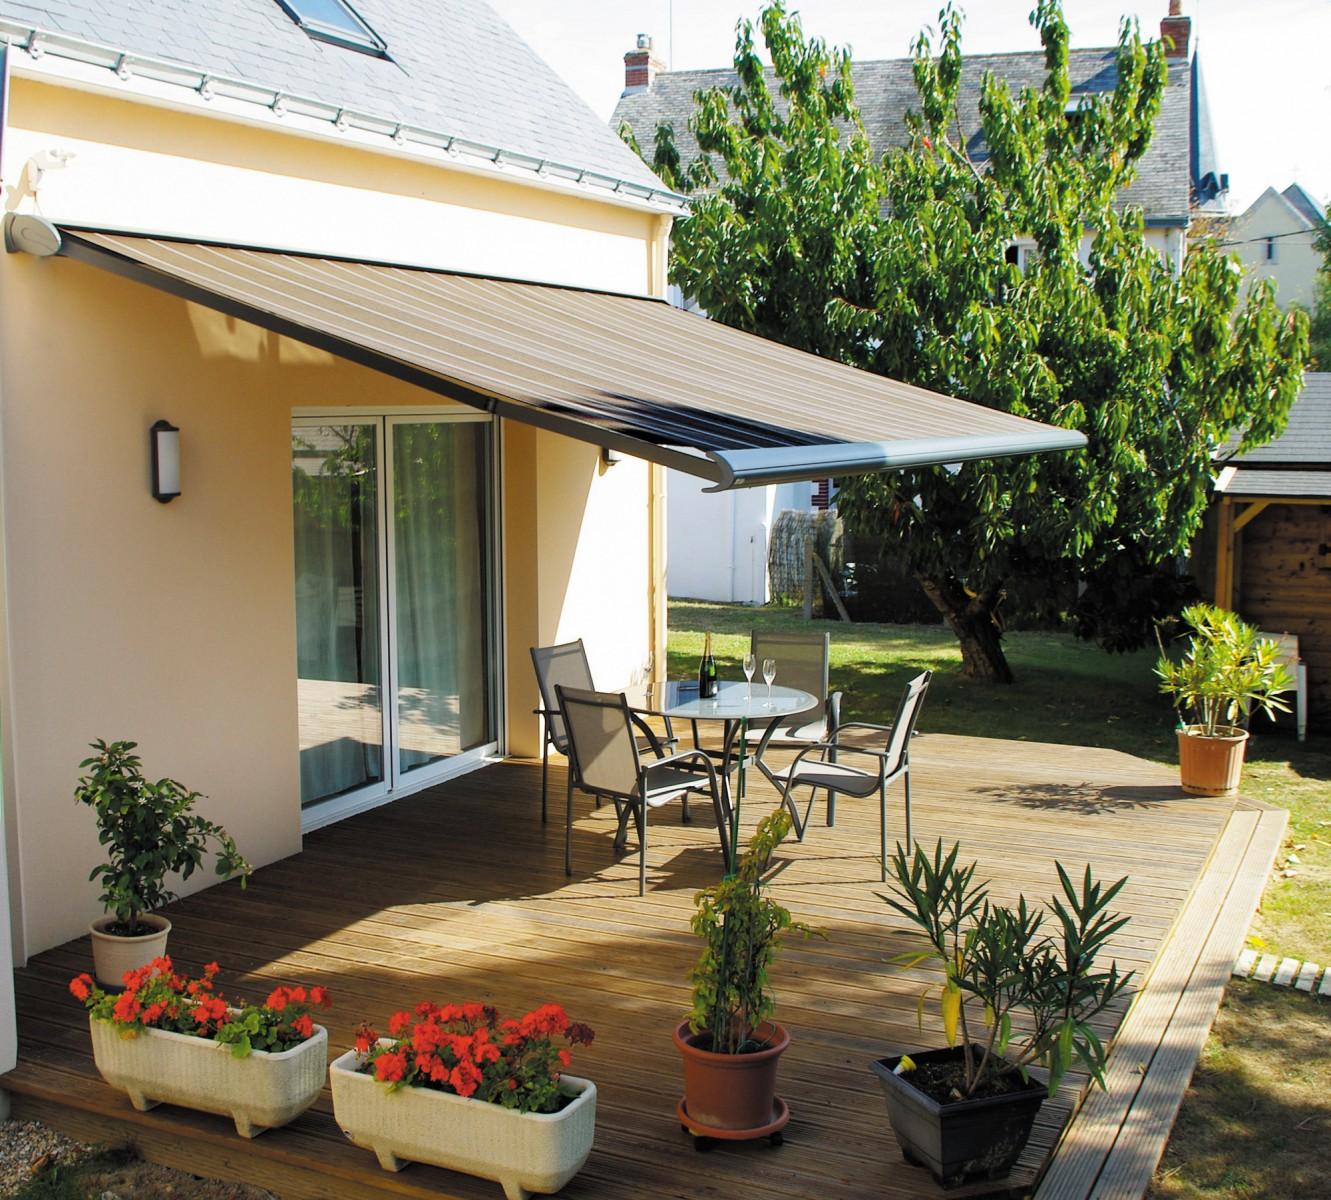 store banne de terrasse best store banne horizon store fenetre maison jardin terrasse with. Black Bedroom Furniture Sets. Home Design Ideas